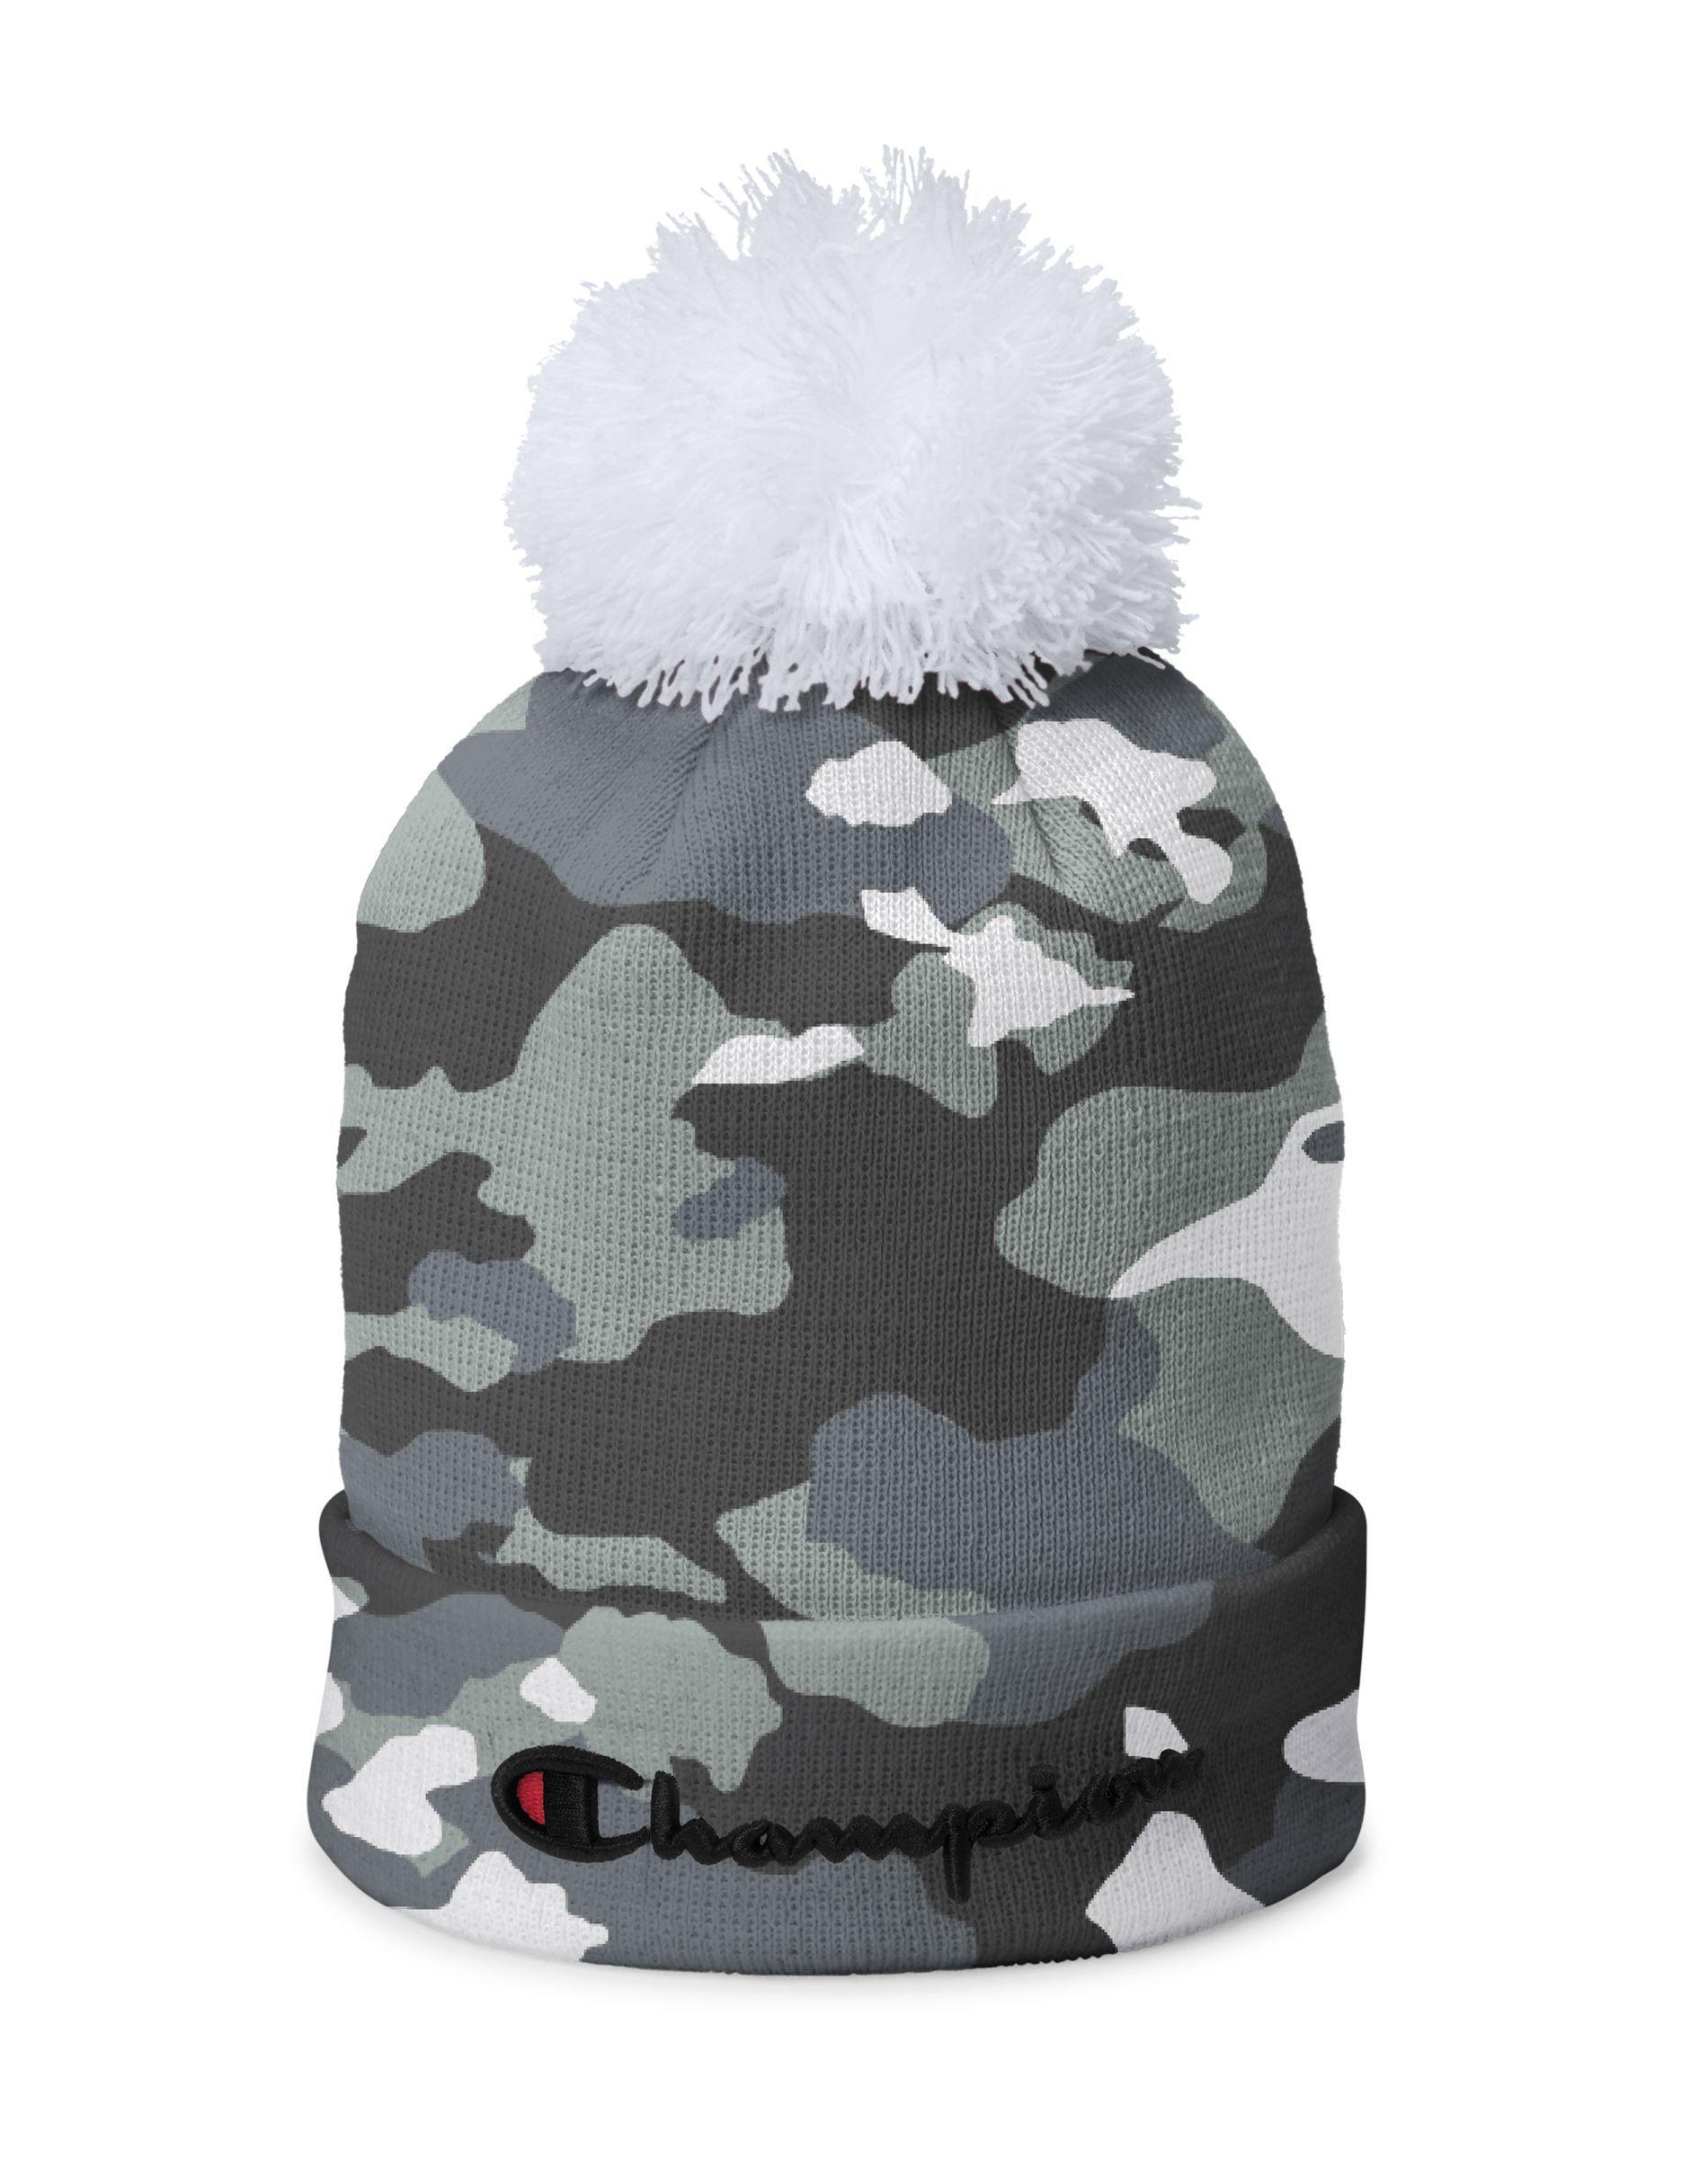 86fb44761d2 Lyst - Champion Life® Script Knit Pom in Gray for Men